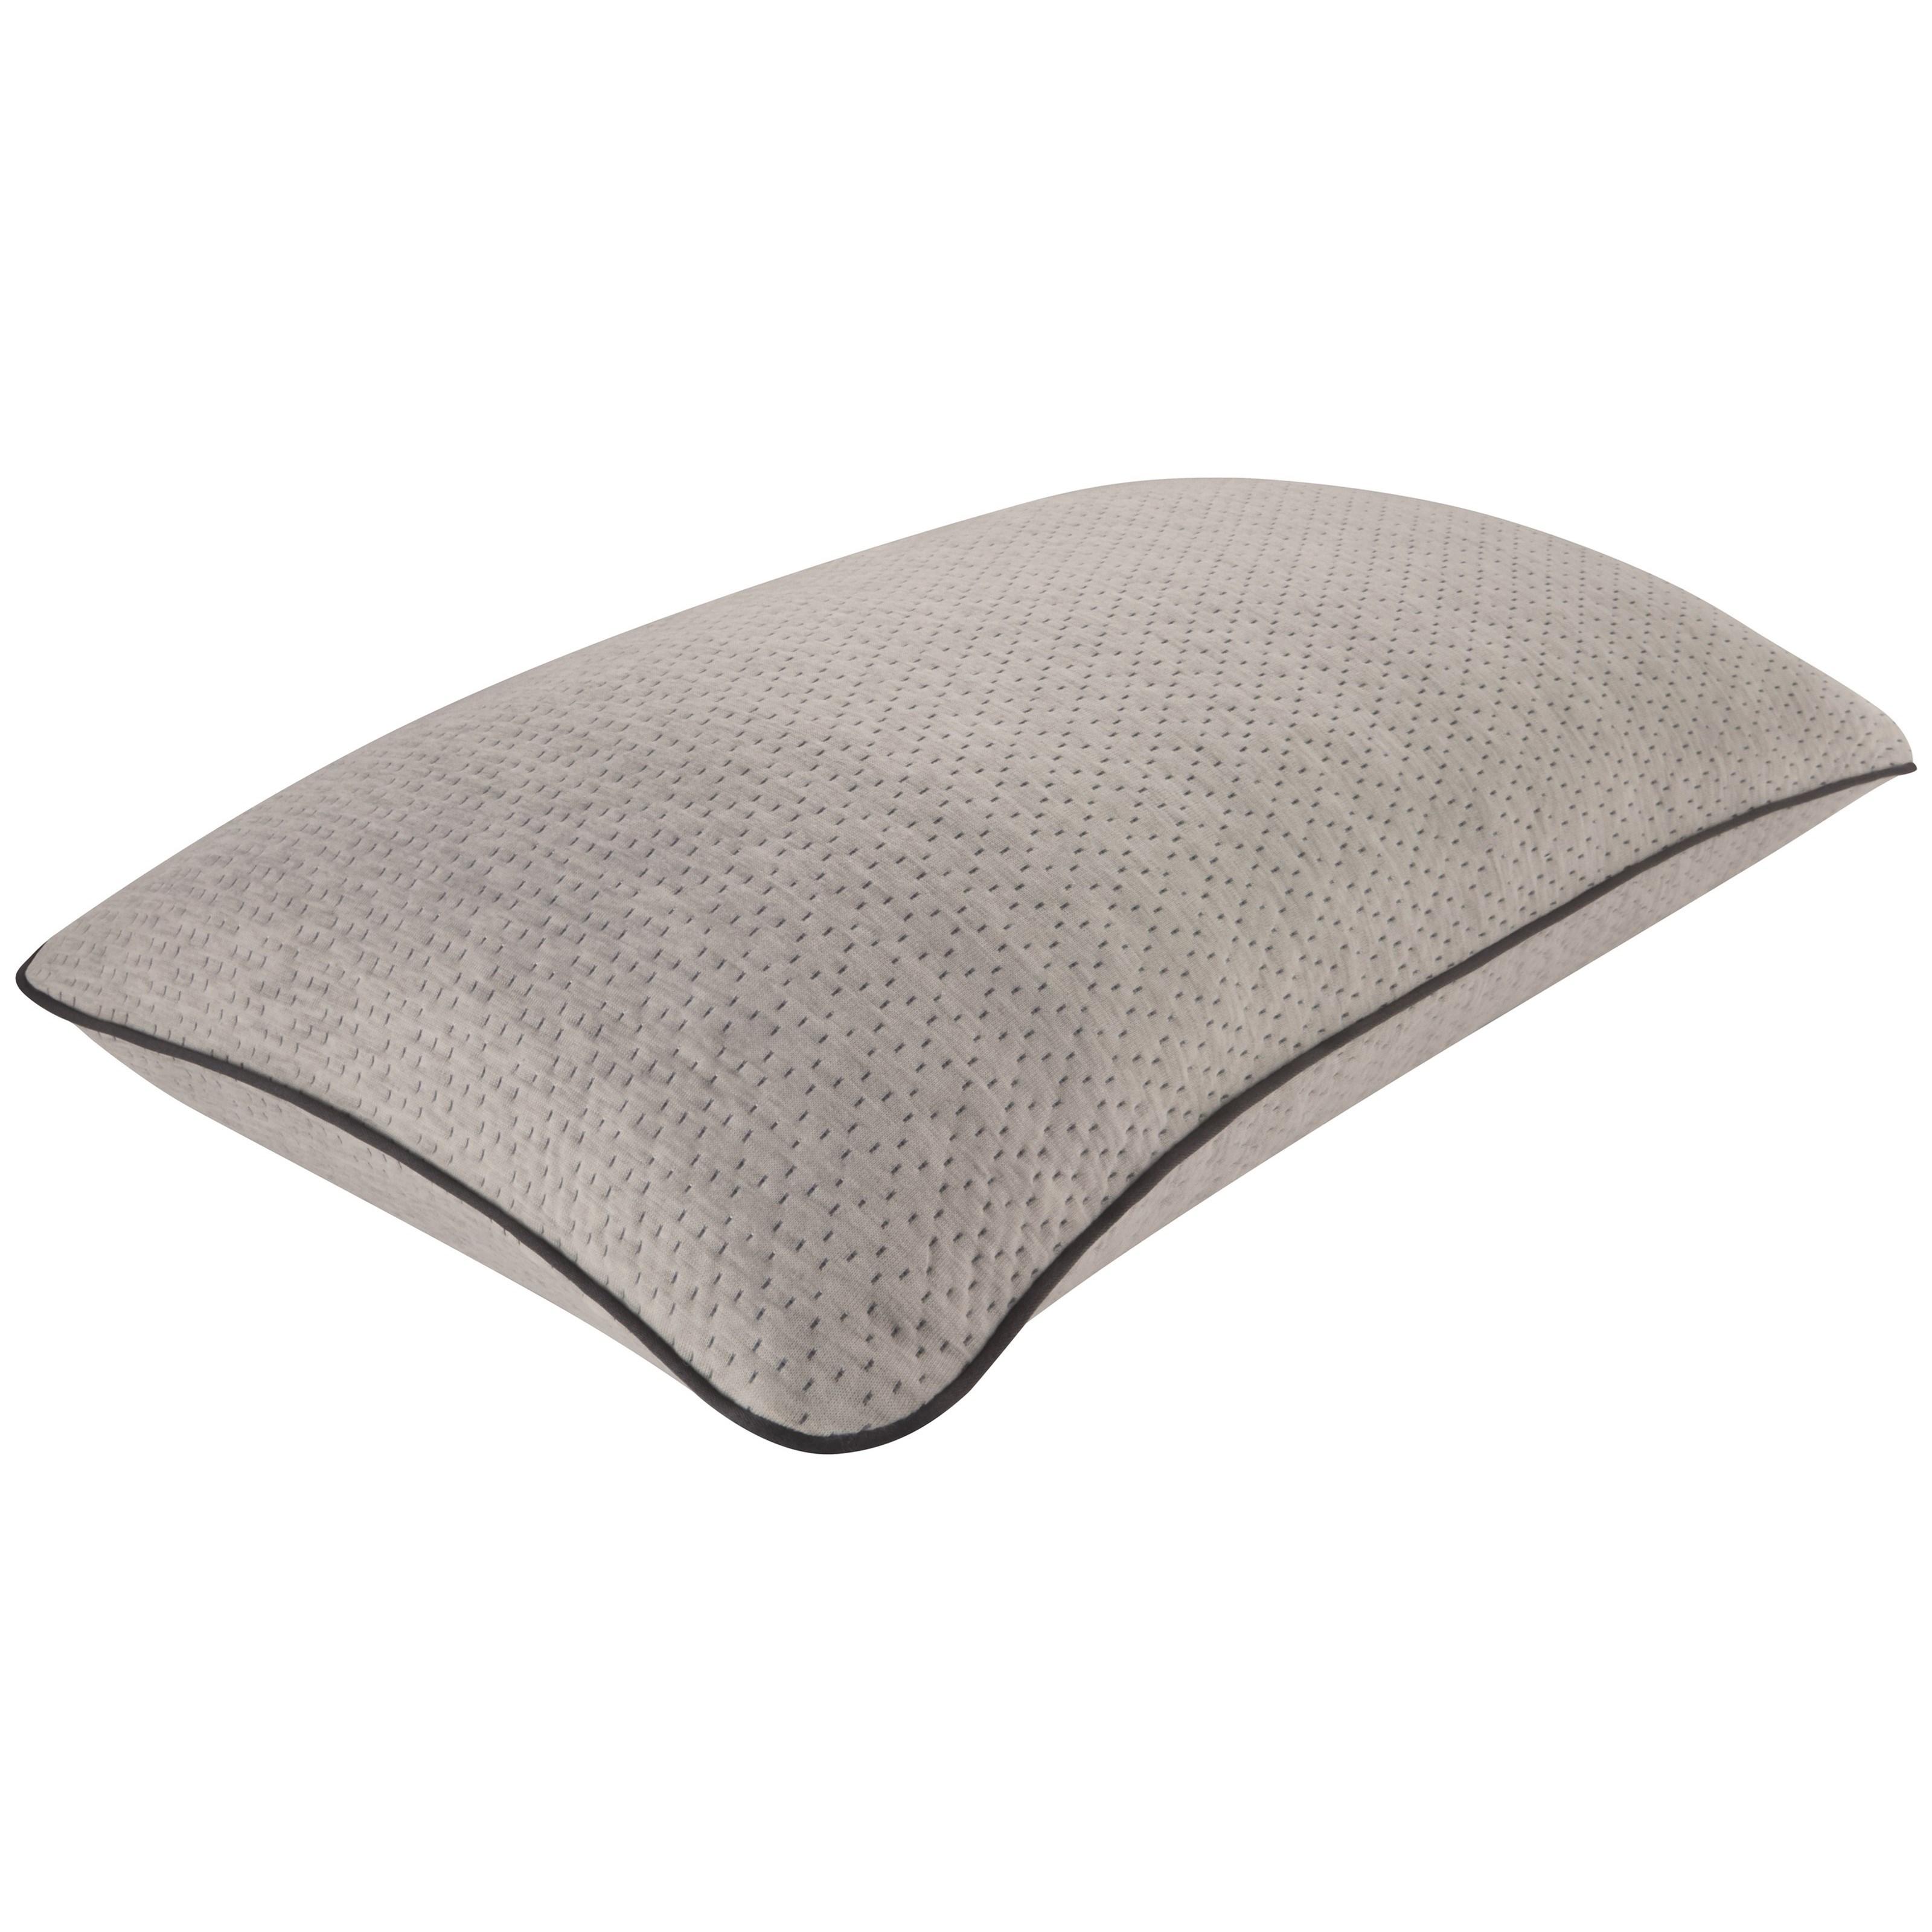 Absolute Rest Memory Foam Pillow